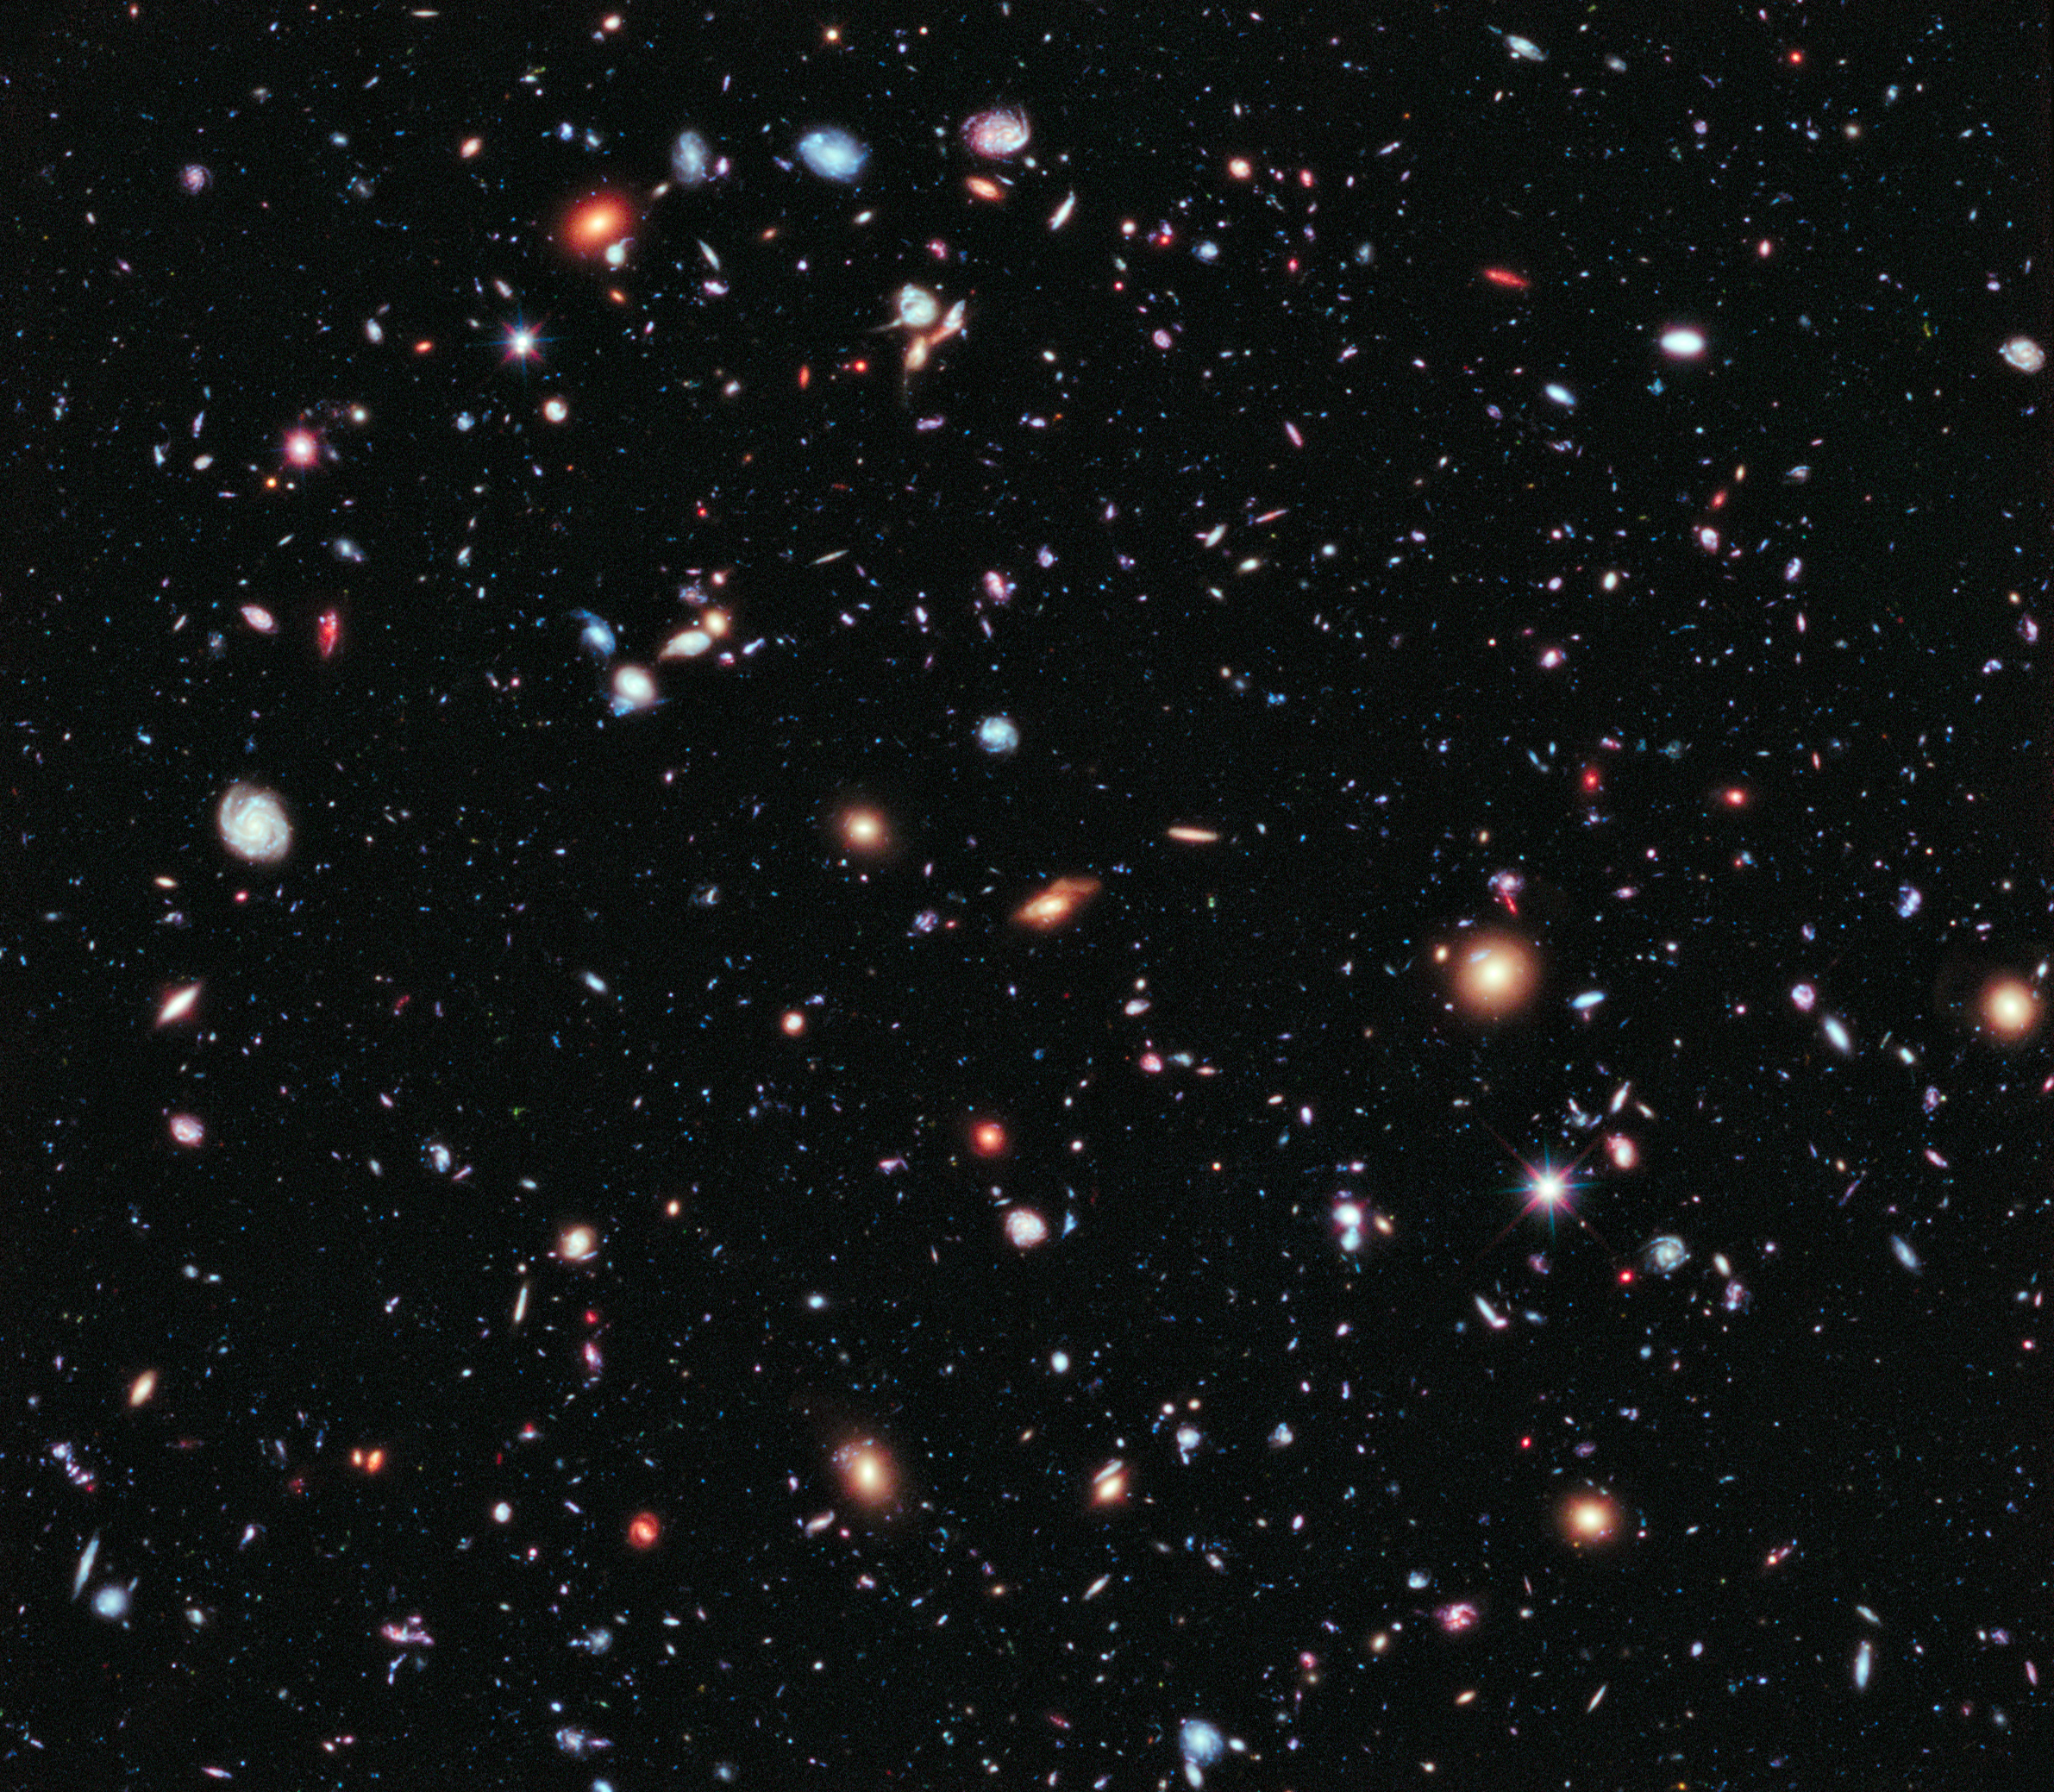 HUBBLE'S TOP 100 •#72 • Credit: NASA, ESA, G. Illingworth, D. Magee, and P. Oesch (University of California, Santa Cruz), R. Bouwens (Leiden University), and the HUDF09 Team